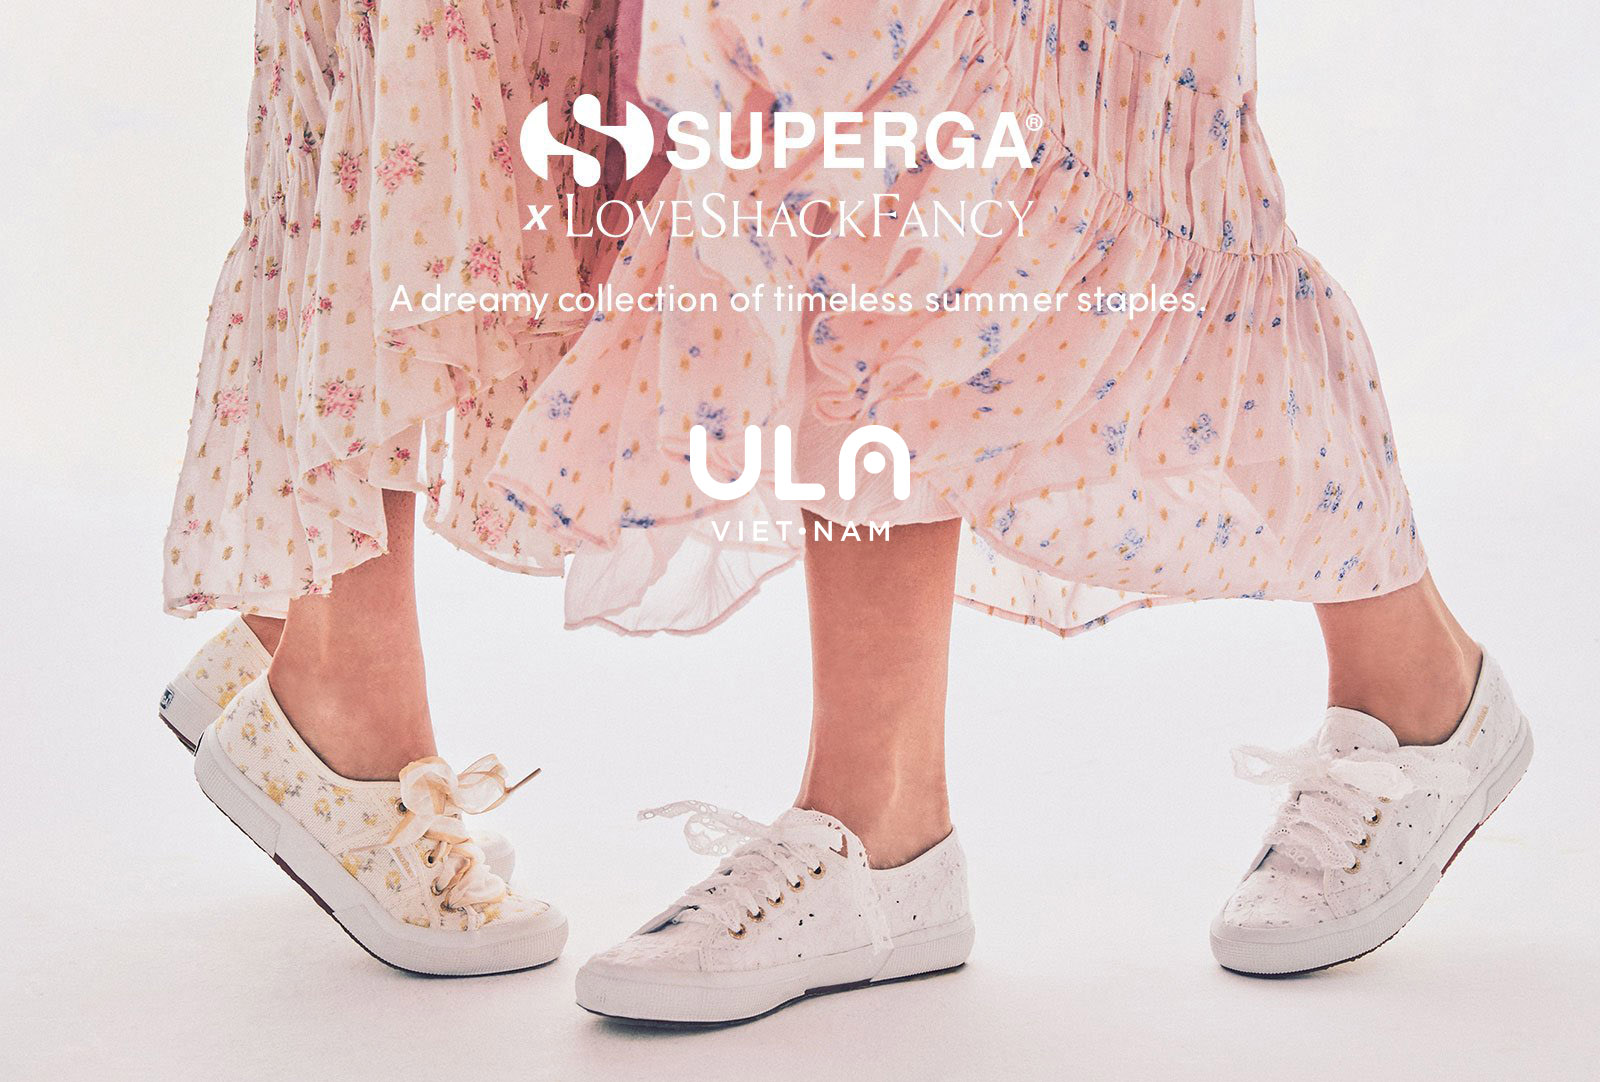 Superga x ULA Vietnam: Premium Online Shopping